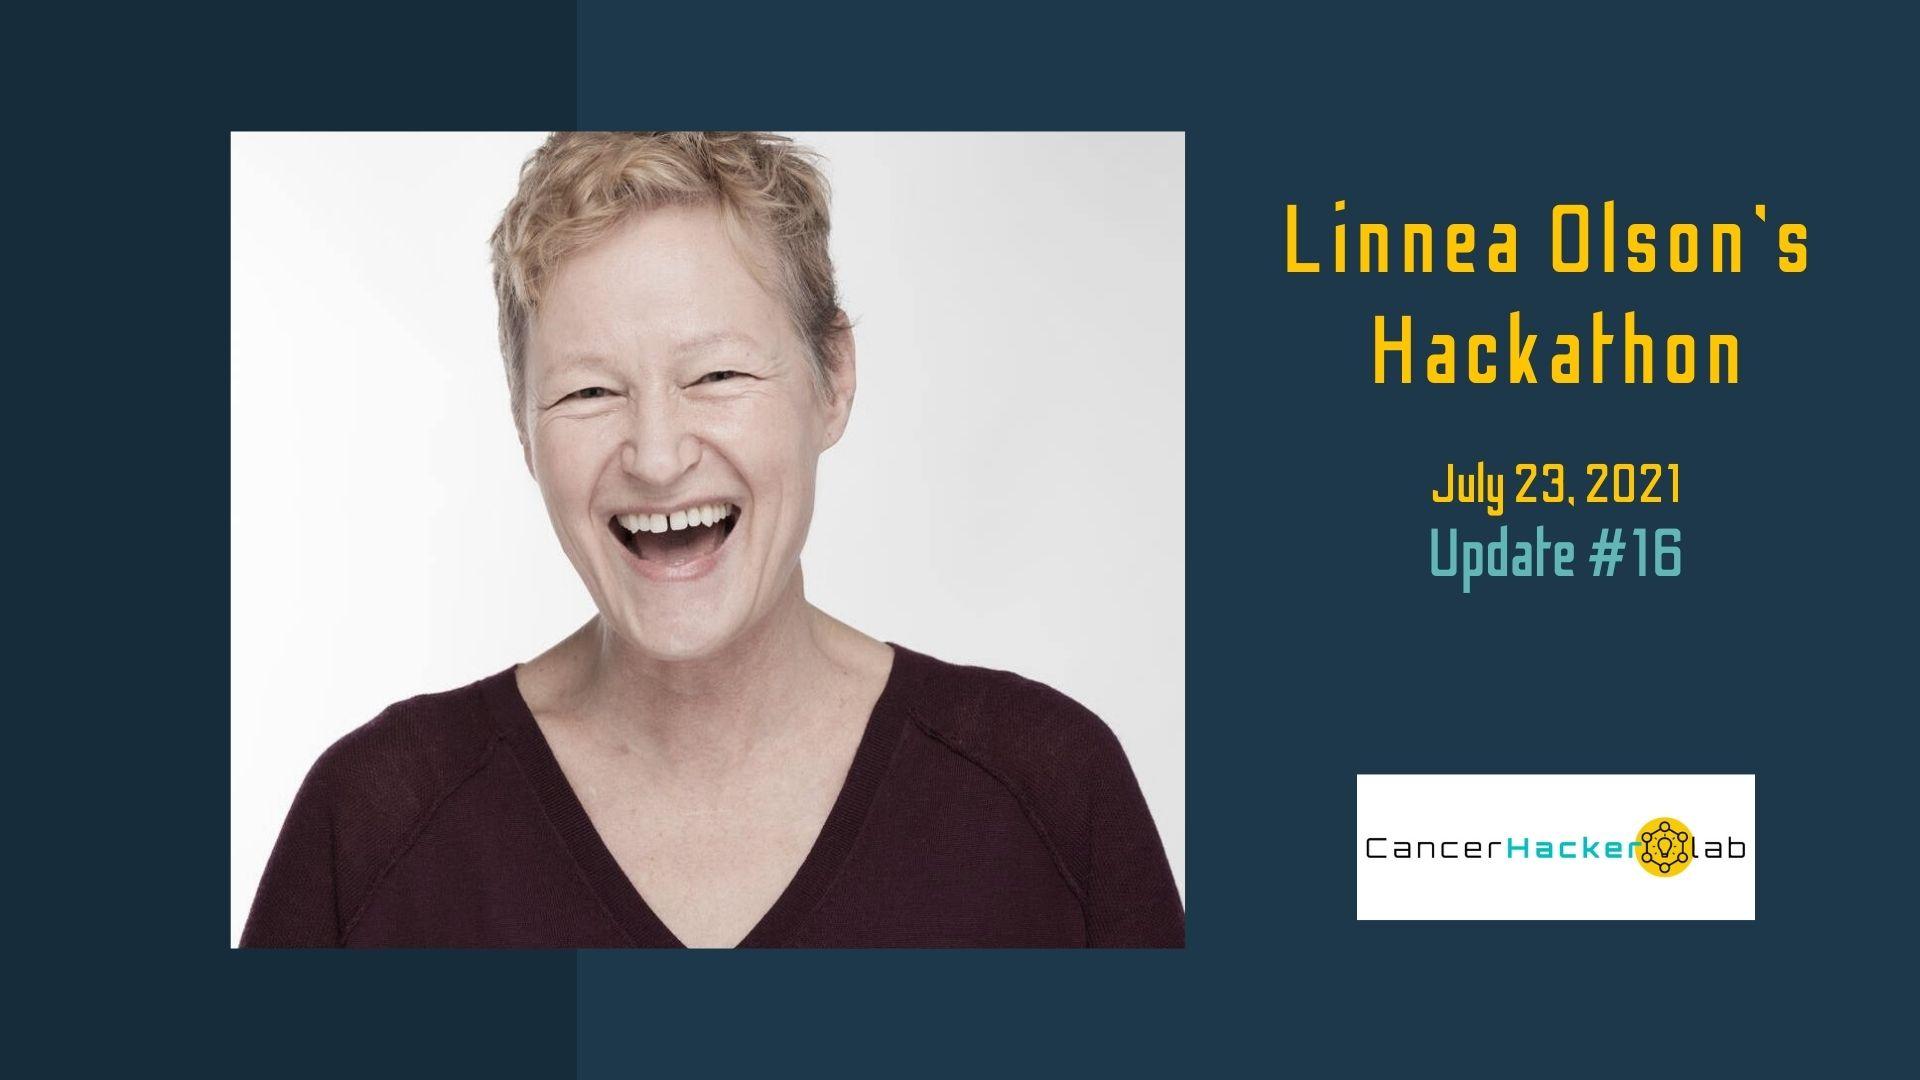 Linnea Olson Update 16